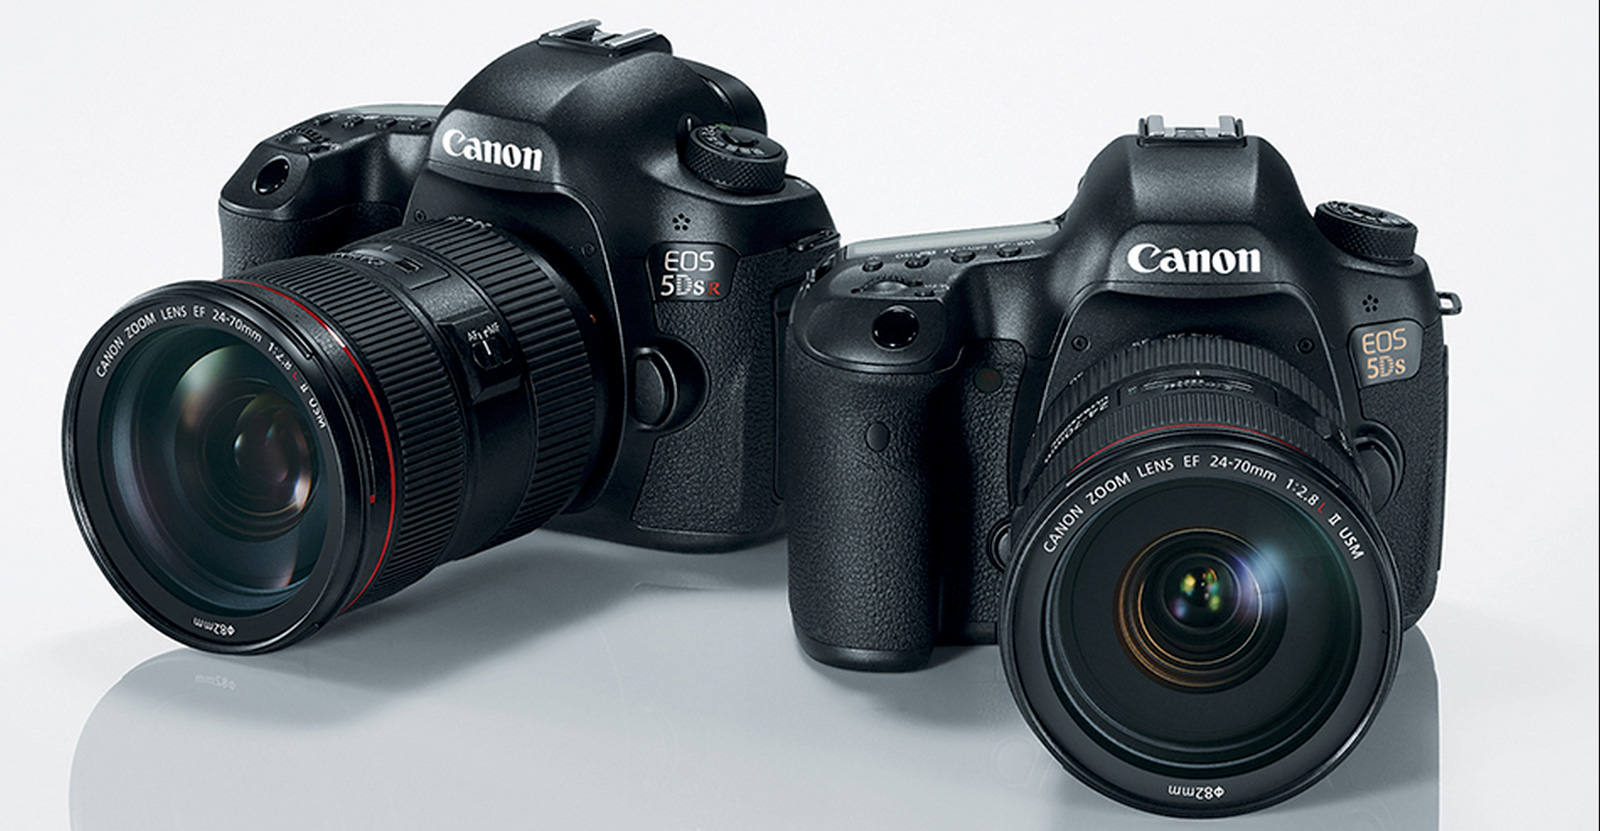 Canon5DS-and-Canon-5DR-50-Megapixel-DSLR